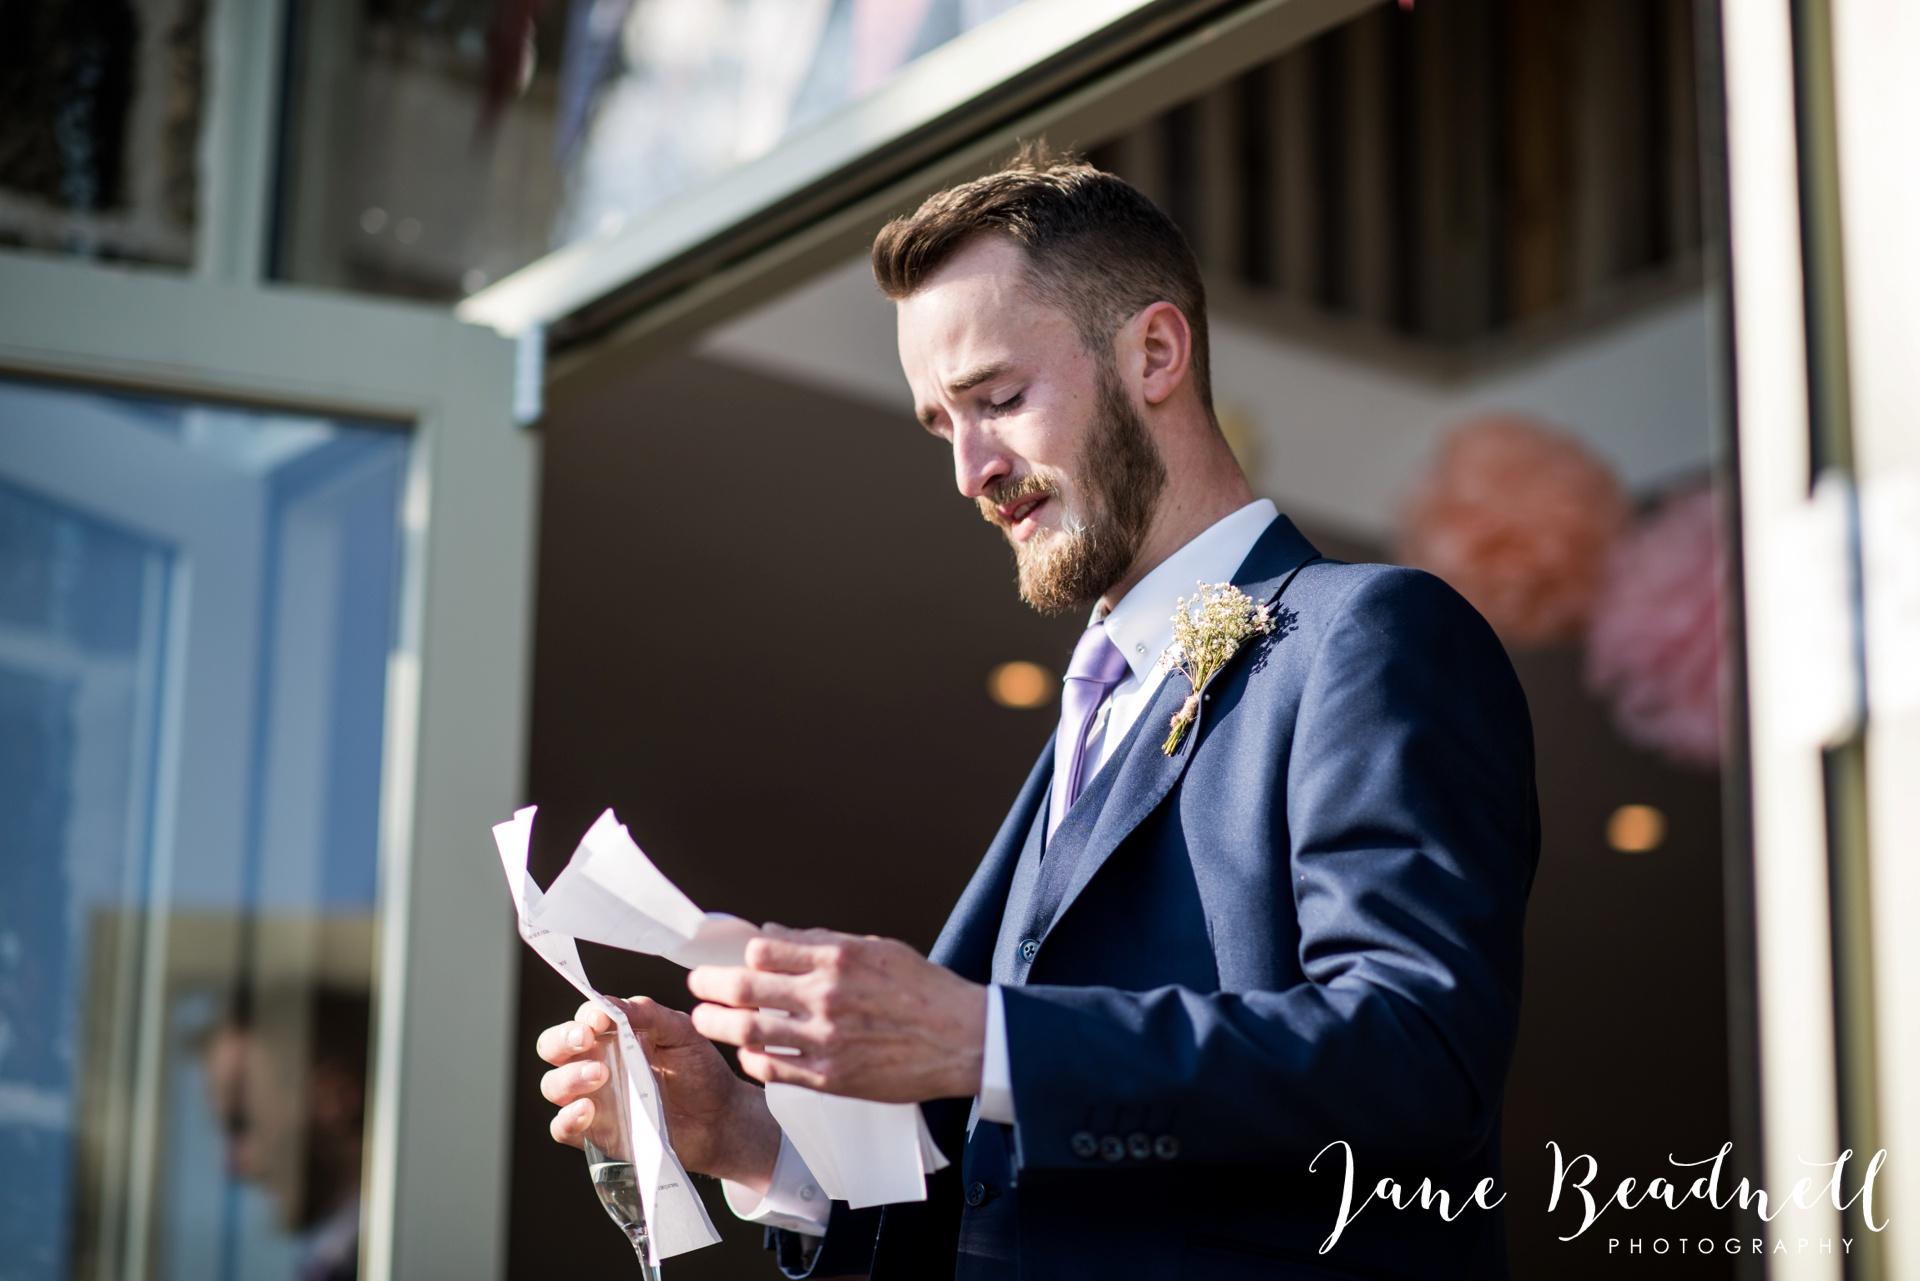 Jane Beadnell fine art wedding photographer The Cheerful Chilli Barn Otley_0043